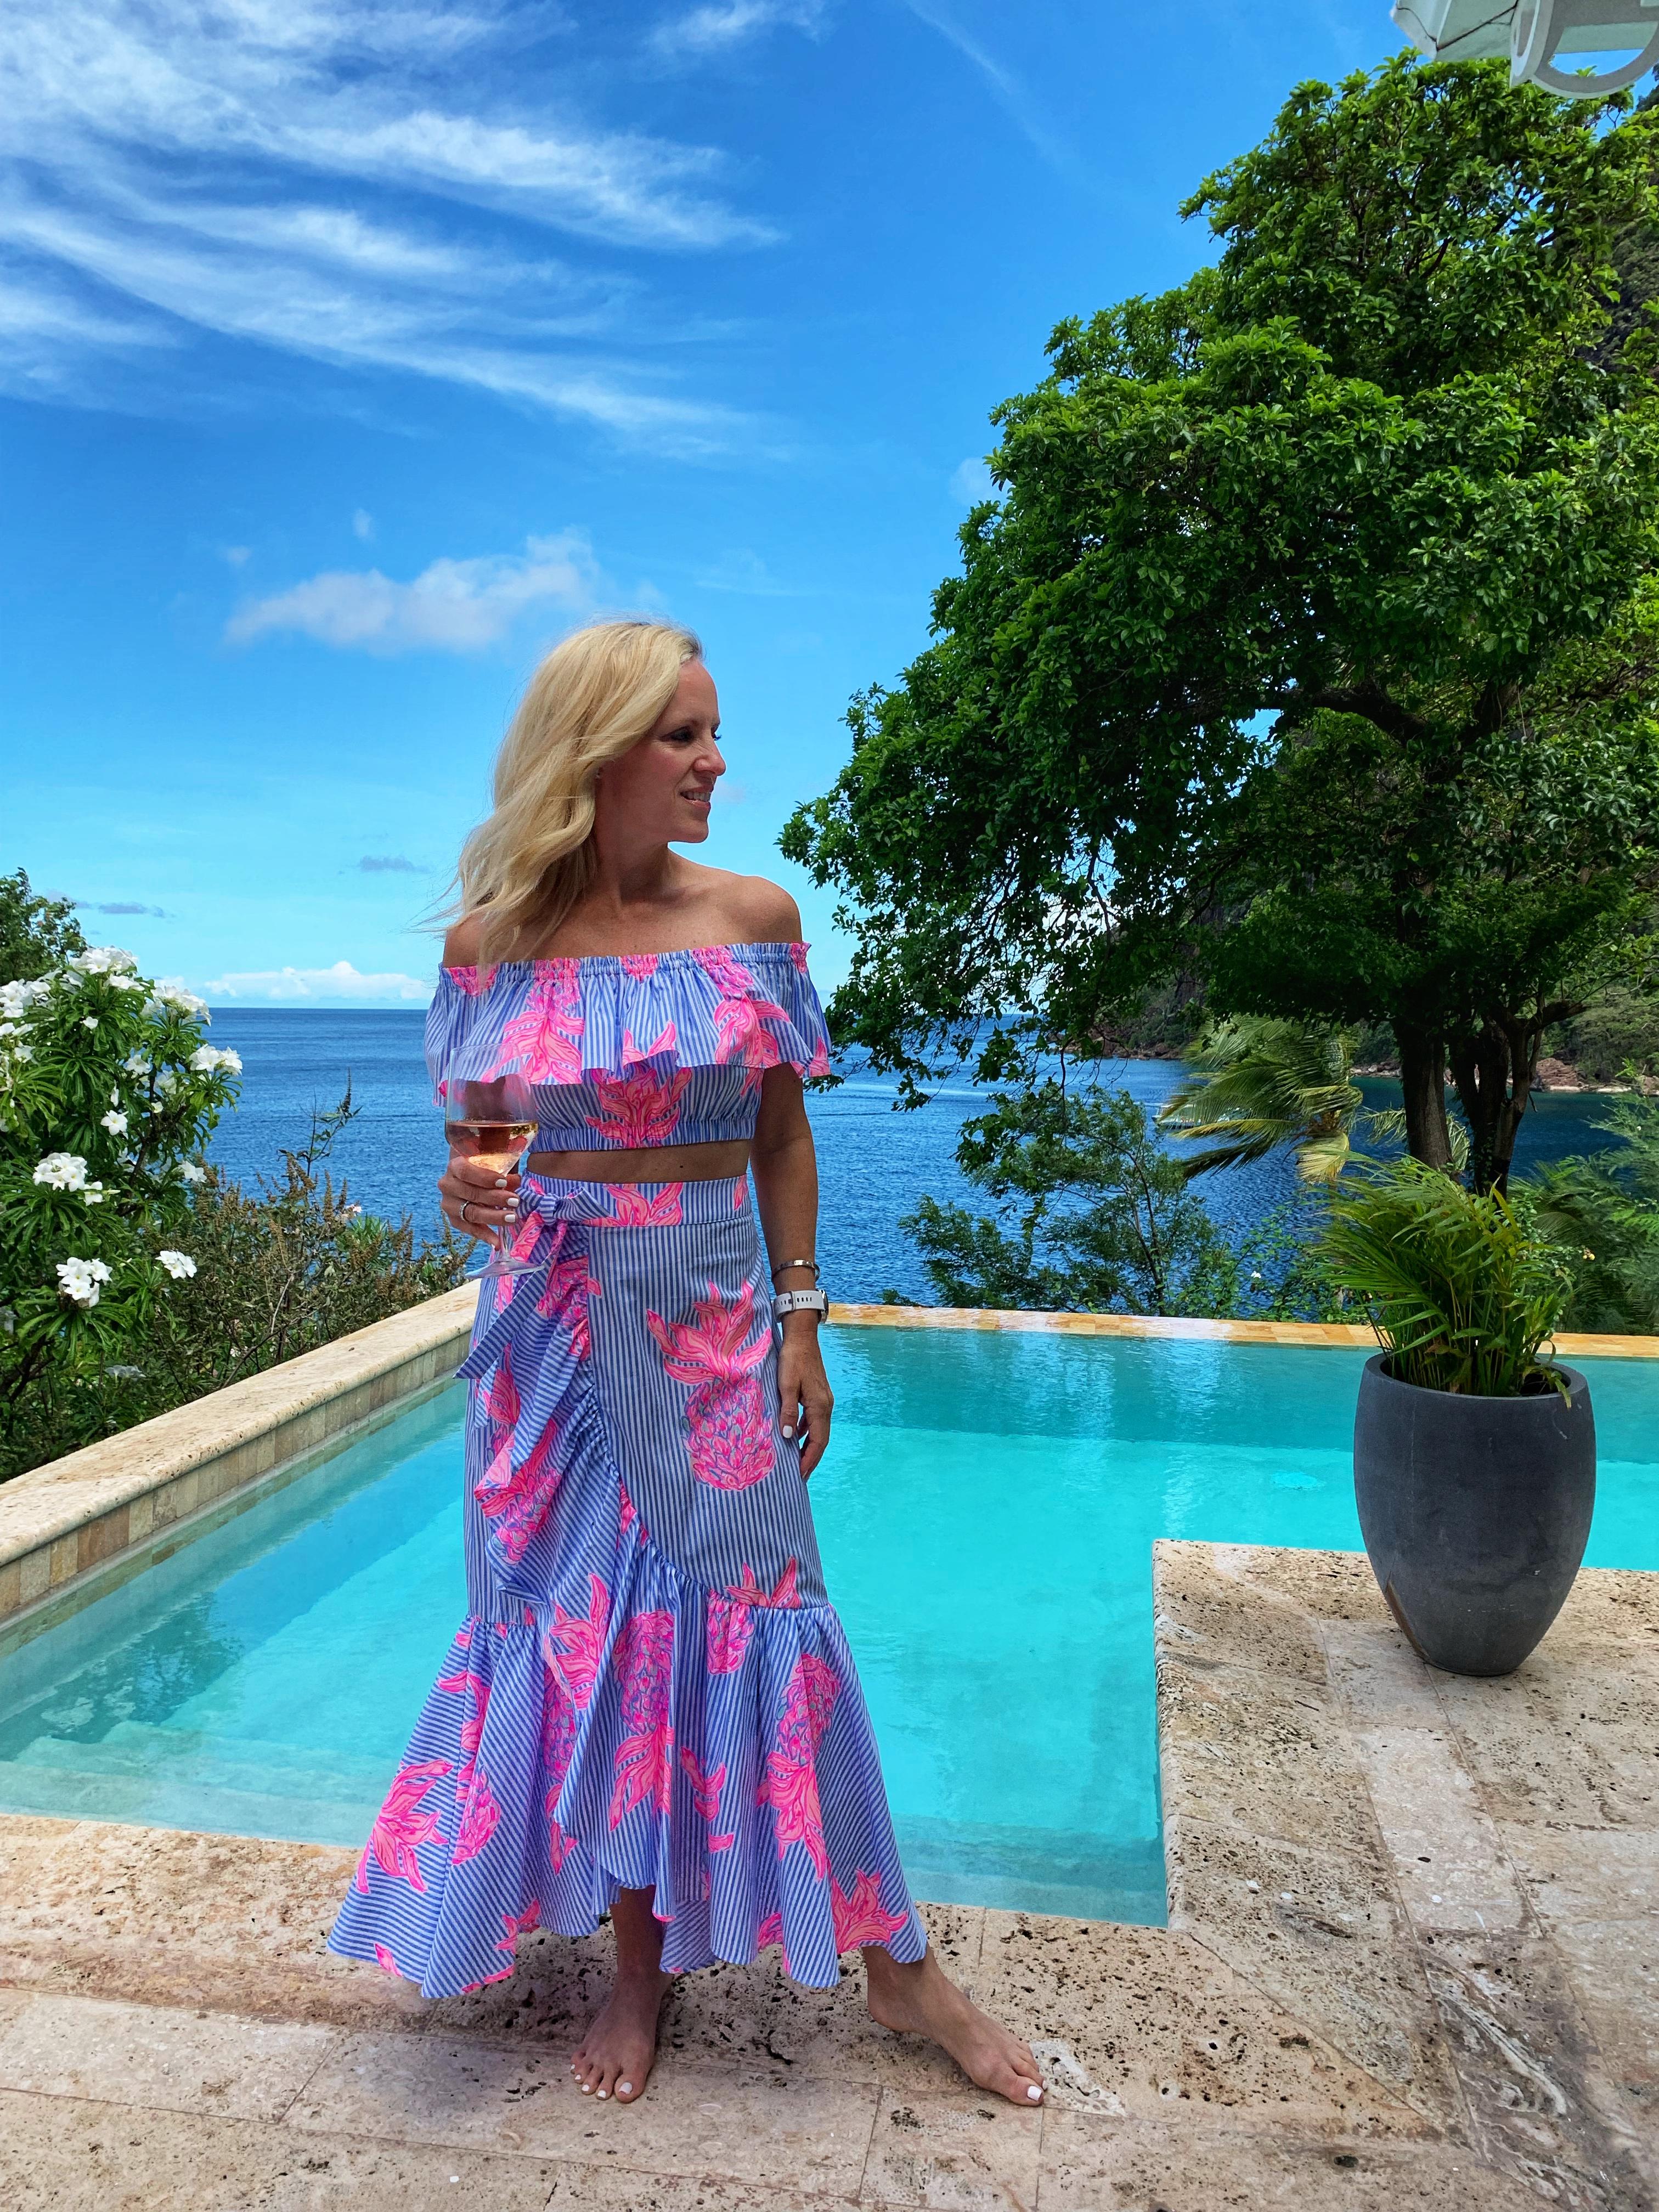 Lilly Pulitzer Maxi skirt, St. Lucia, Sugar Beach, Viceroy Sugar Beach, Alicia Wood, Dallas Travel Blogger